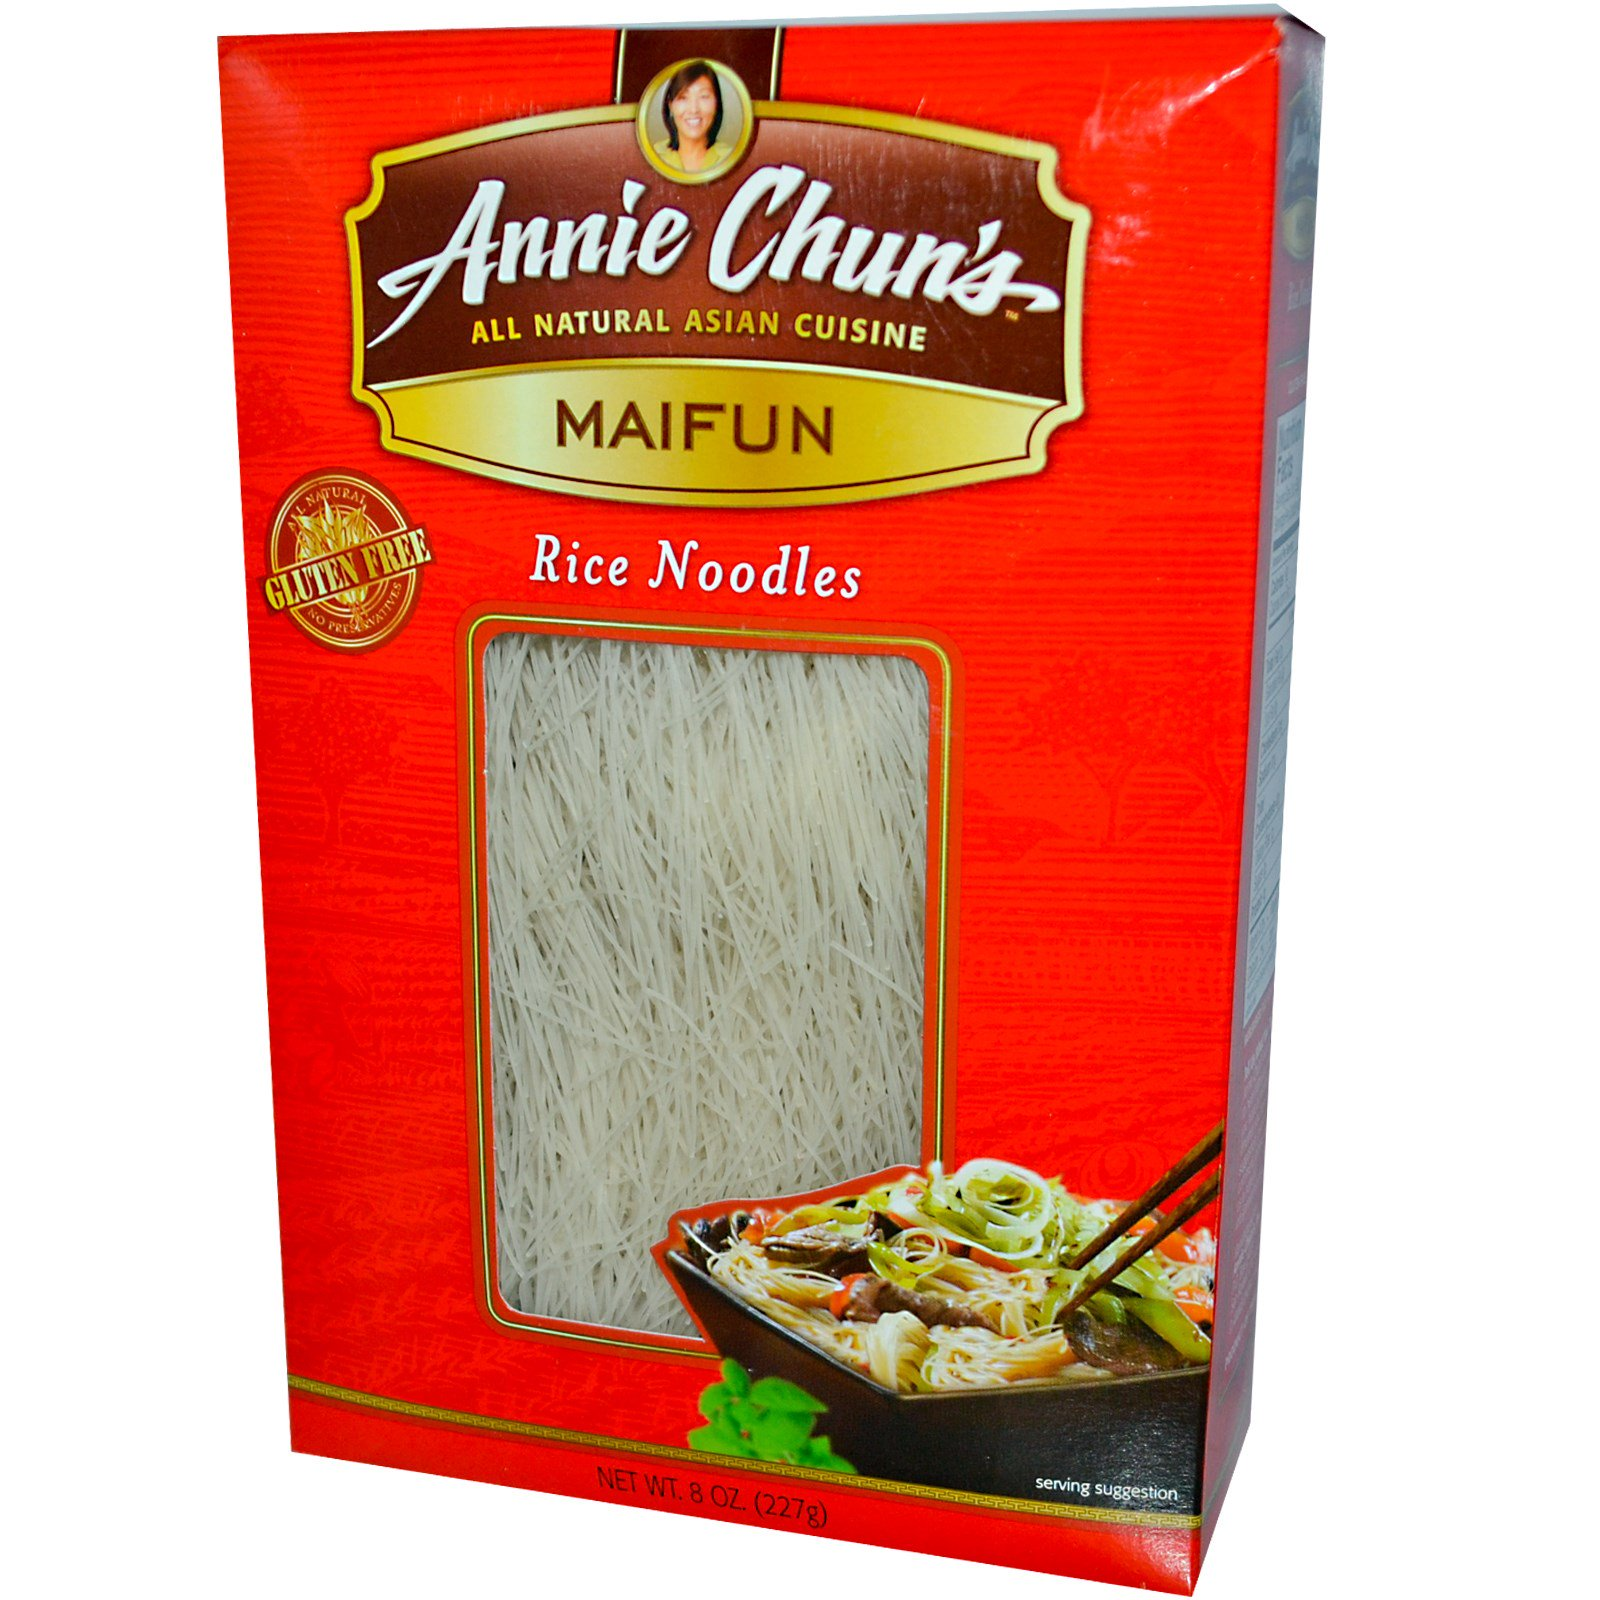 Mai fun rice noodles